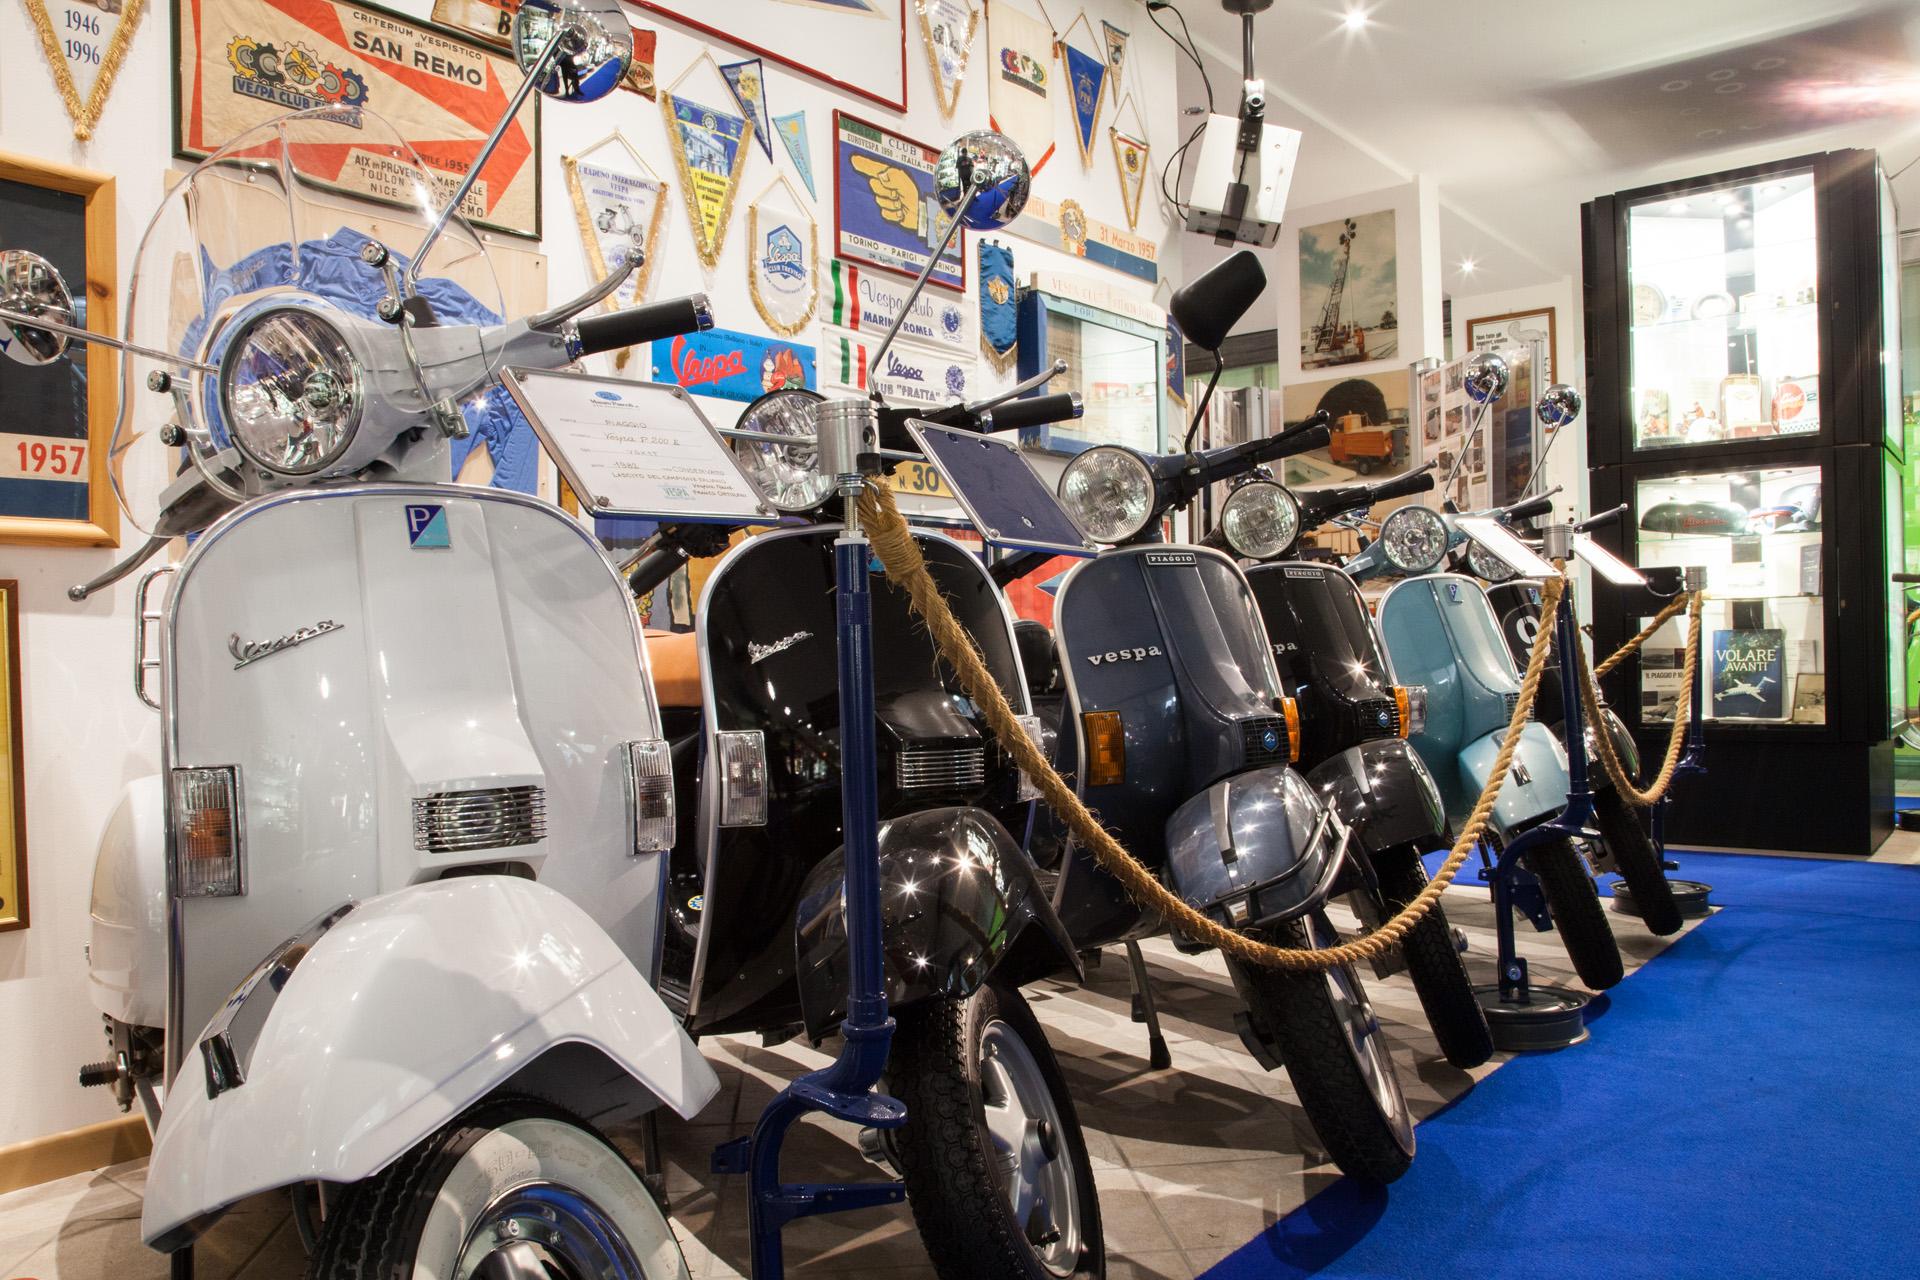 Raduno Internazionale Registro Storico Vespa a Ravenna